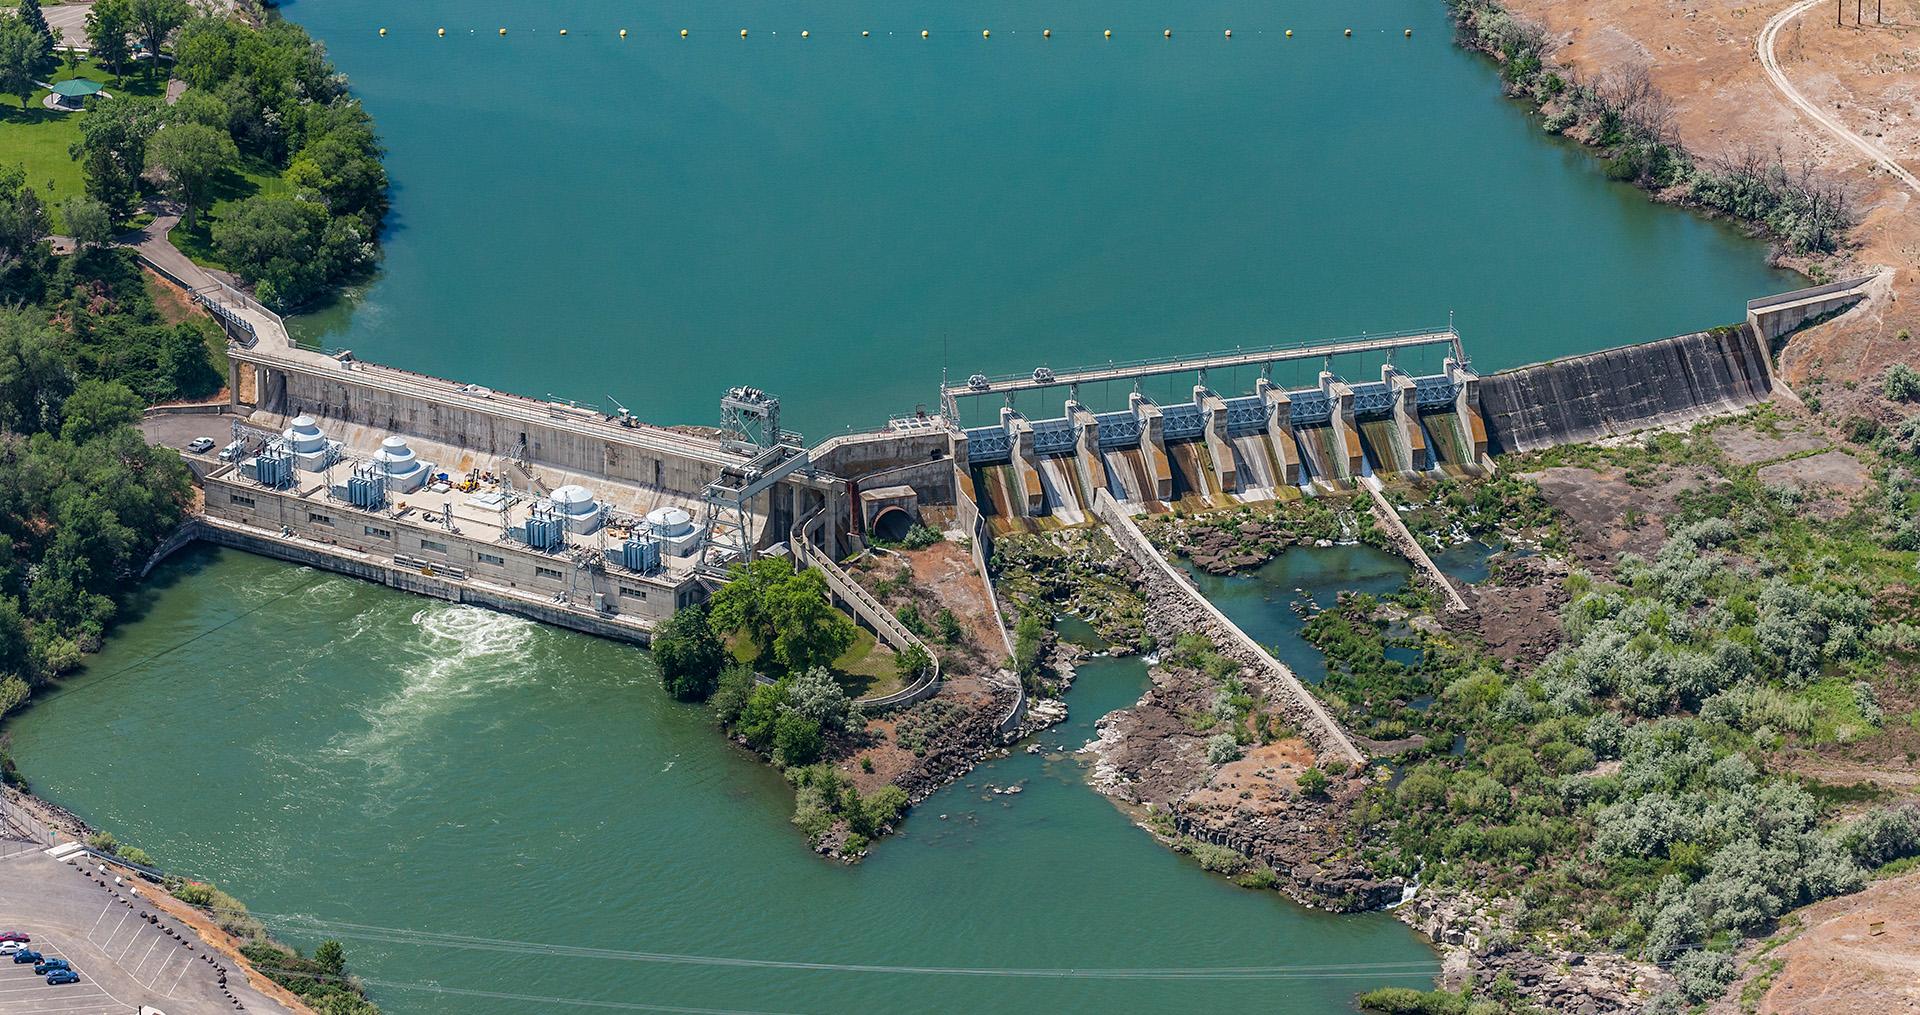 Lower Salmon Dam